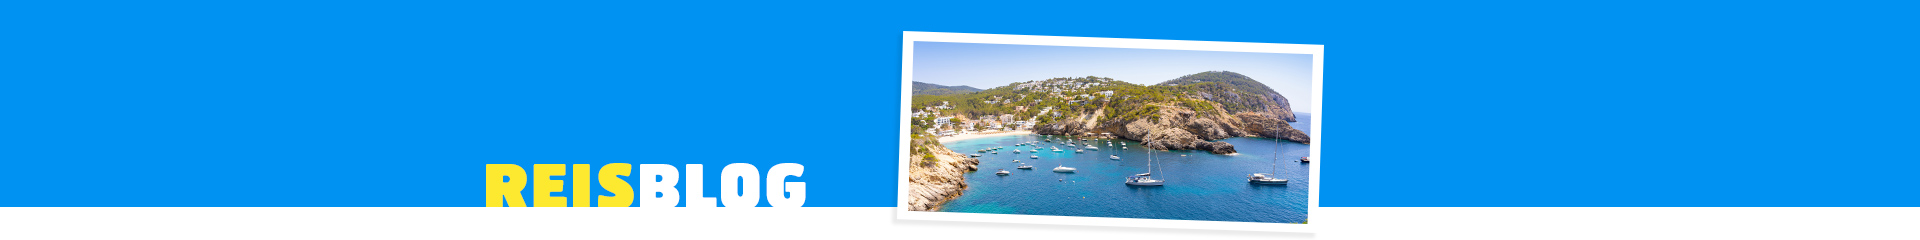 De mooiste stranden van Ibiza